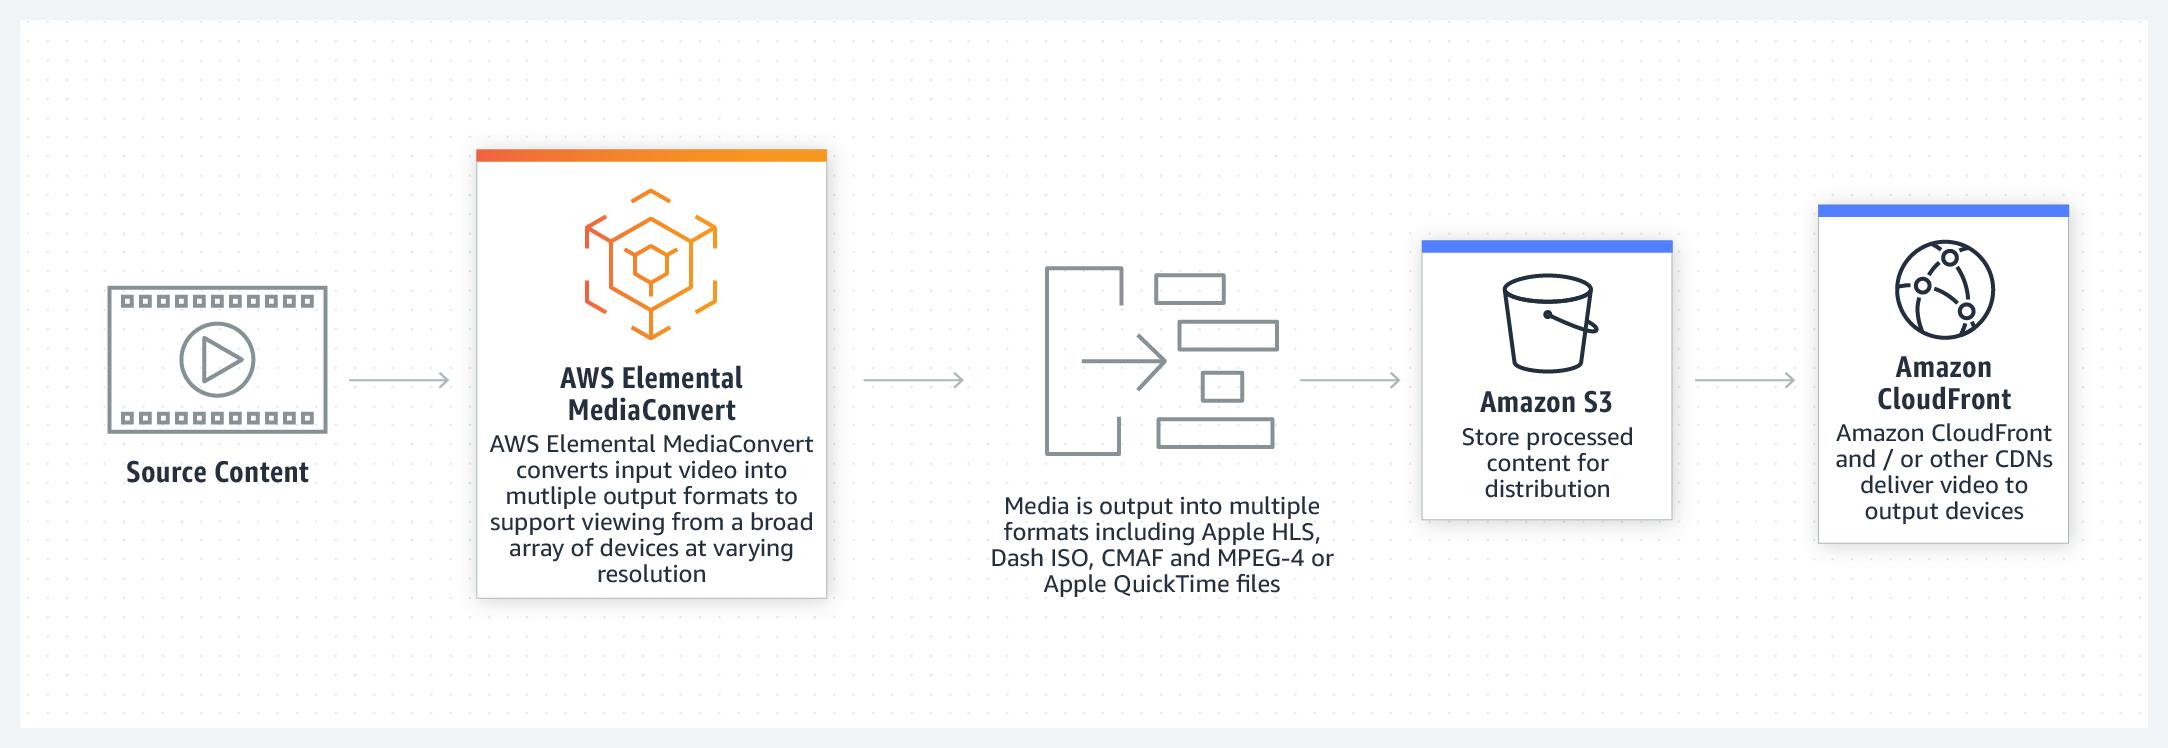 product-page-diagram-Elemental-MediaConvert@2x